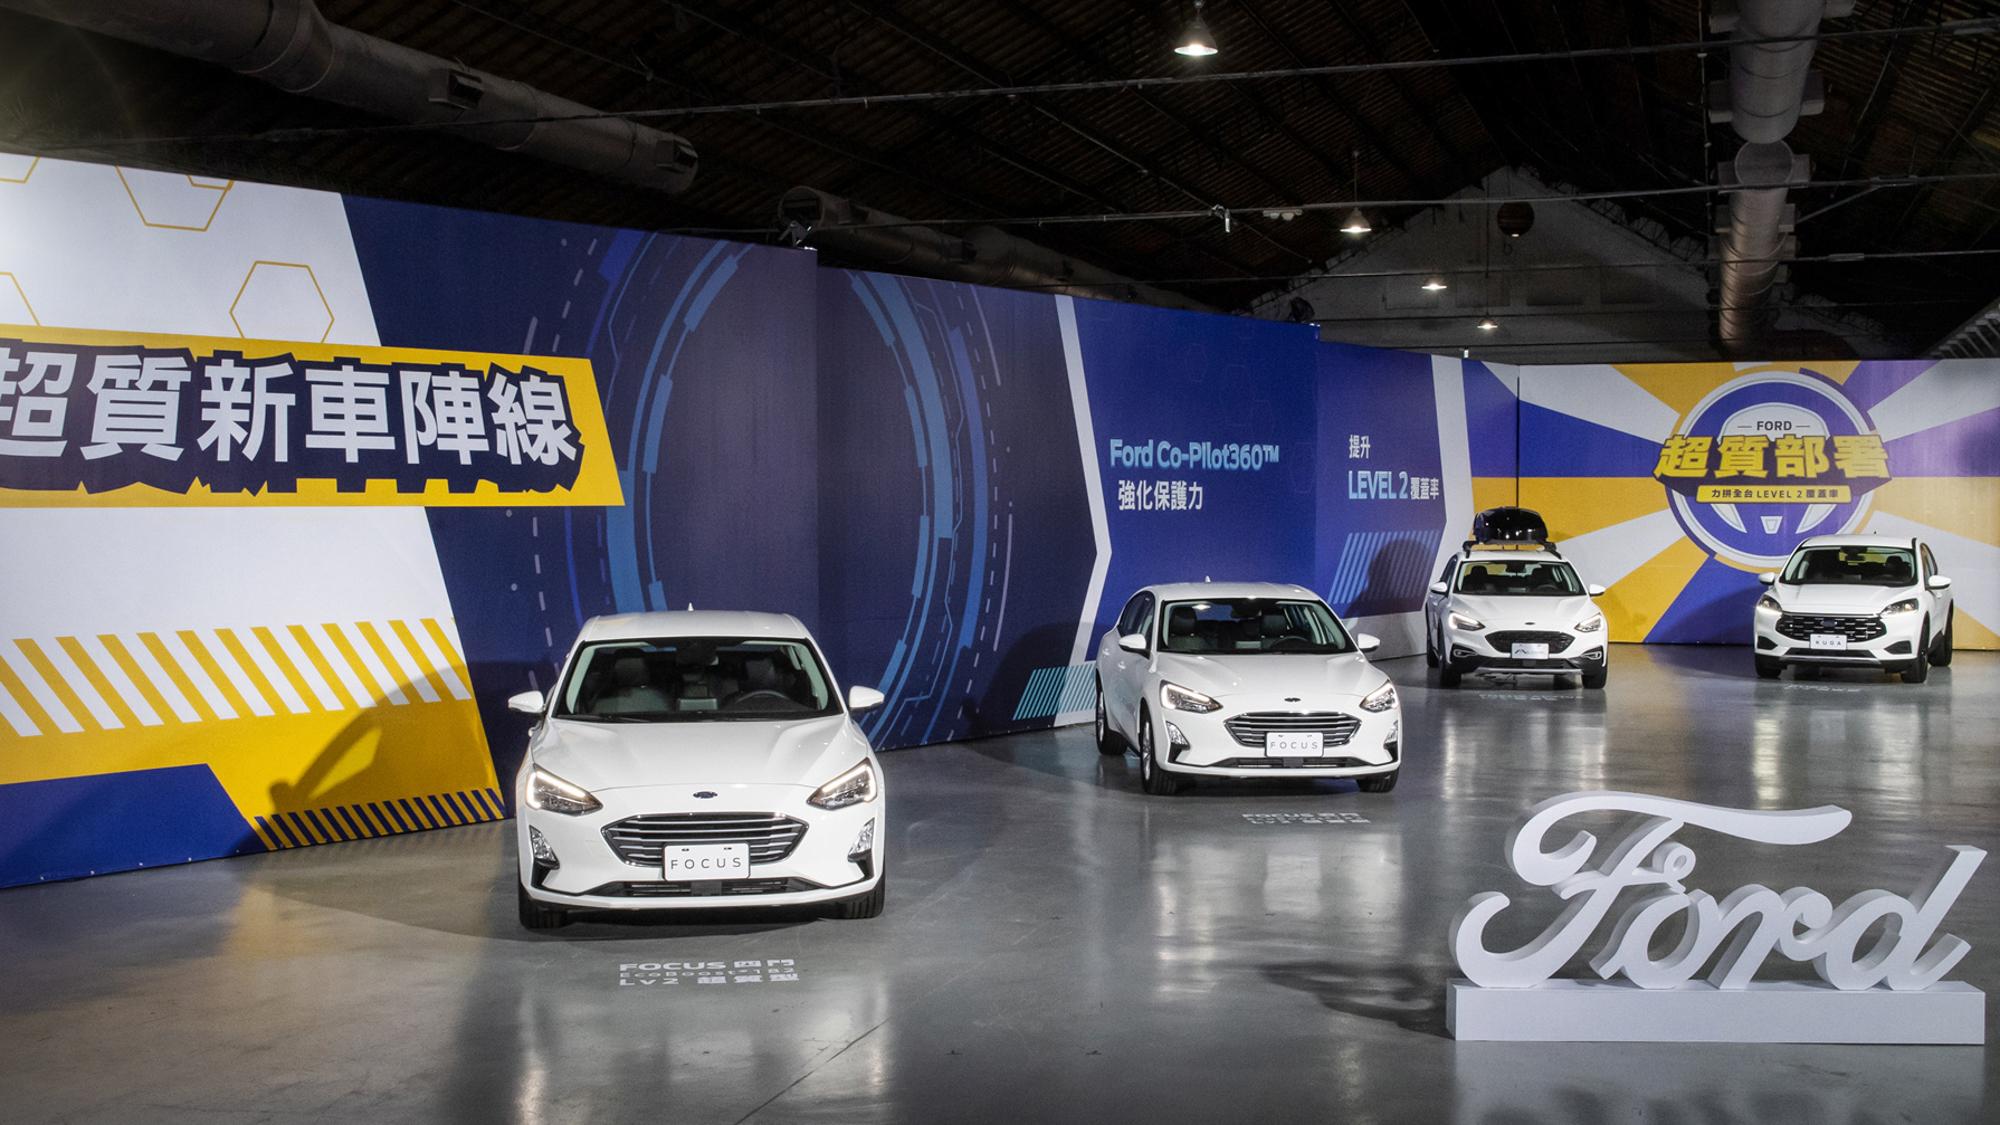 ▲ Ford Focus / Kuga 超質型車系推出!主打 Level 2 輔助科技力拼安全「超值」